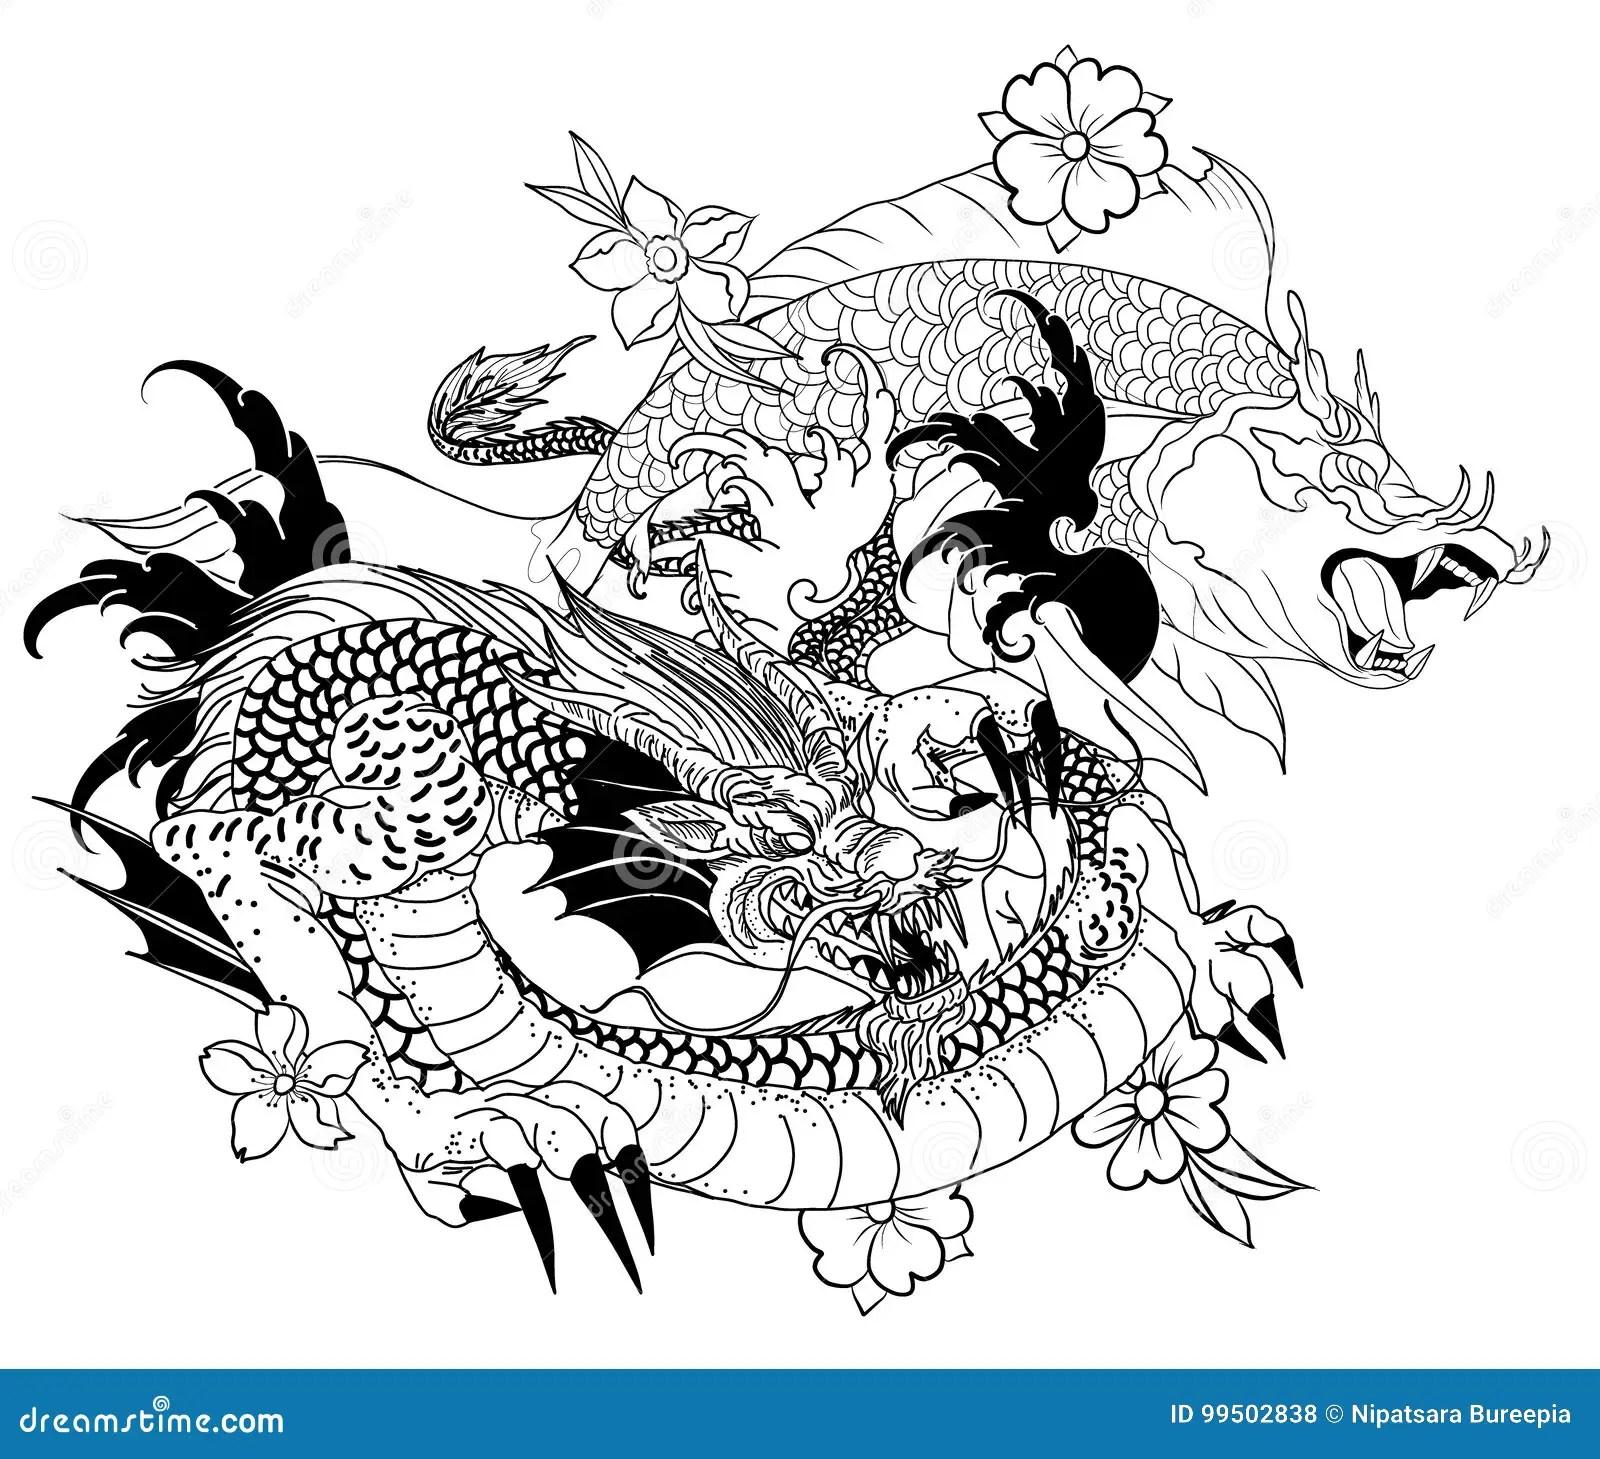 Japanese Dragon Drawings Easy